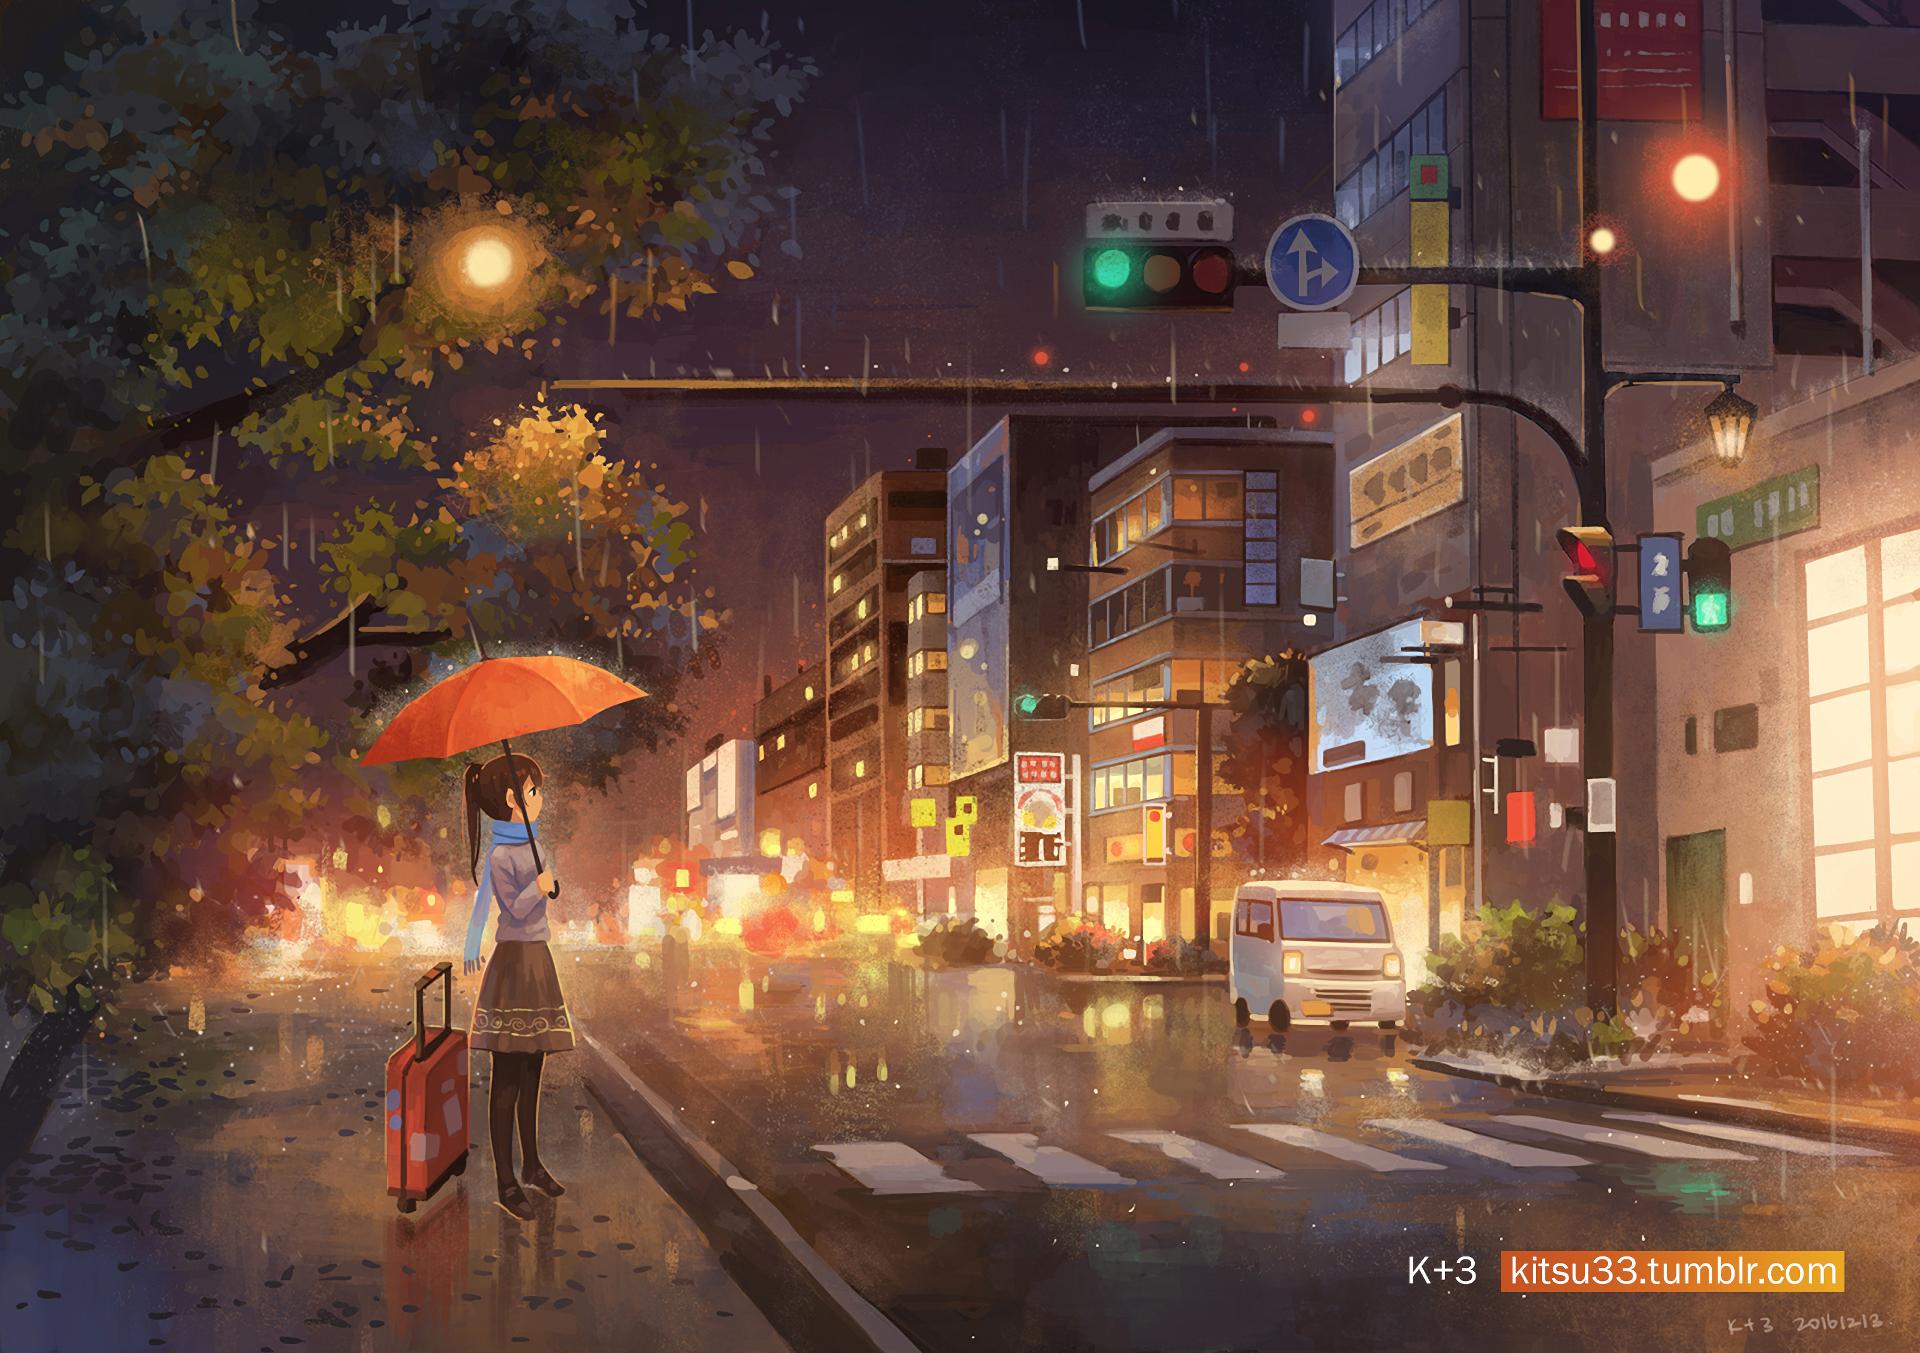 Anime Original Wallpaper In 2020 Anime Scenery Anime Scenery Wallpaper Scenery Wallpaper